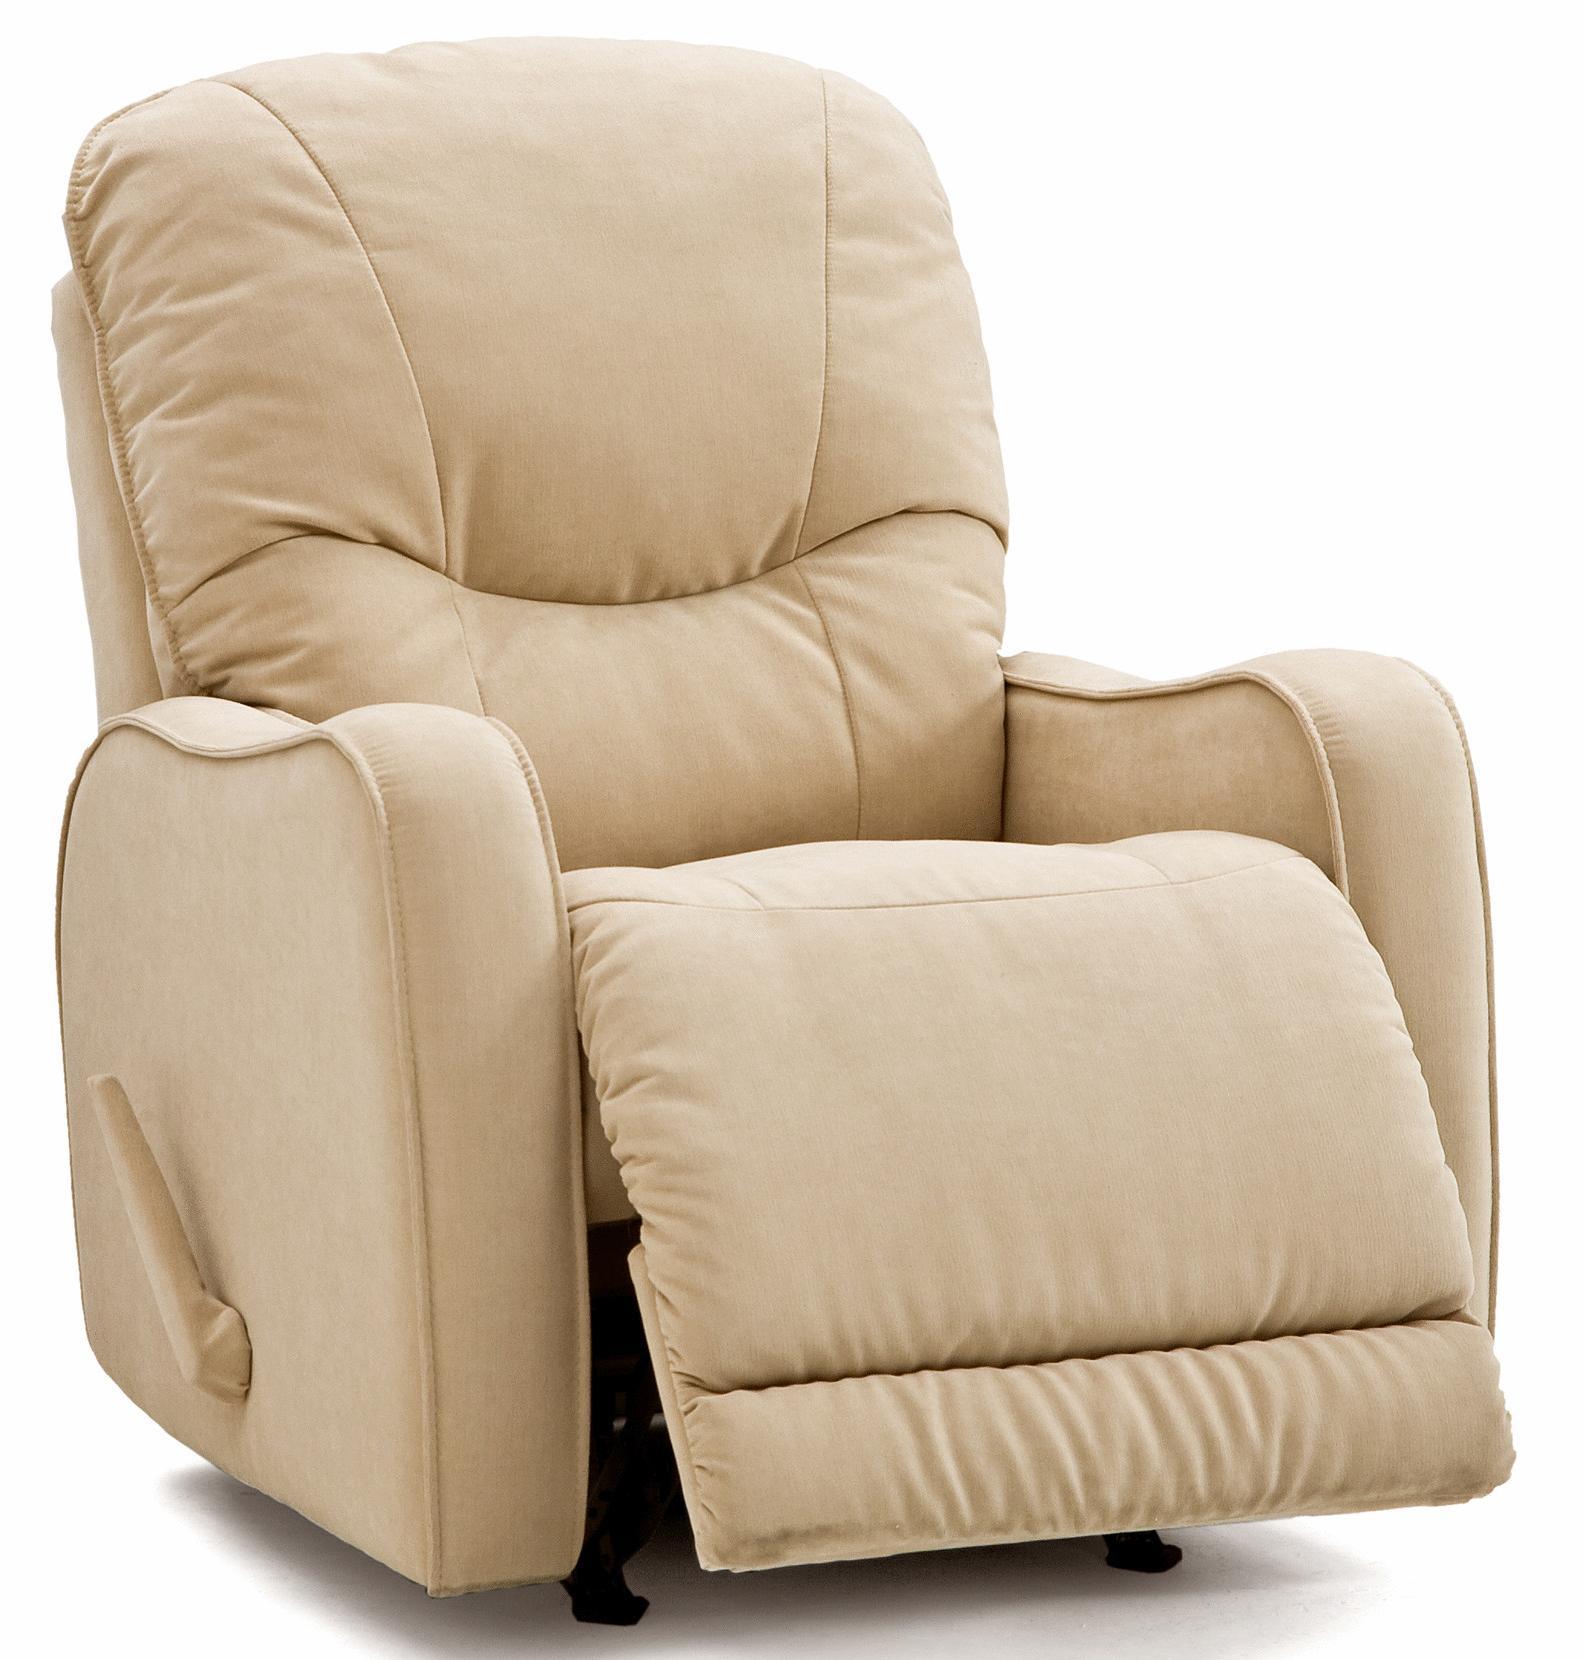 Yates  Power Lift Chair by Palliser at A1 Furniture & Mattress